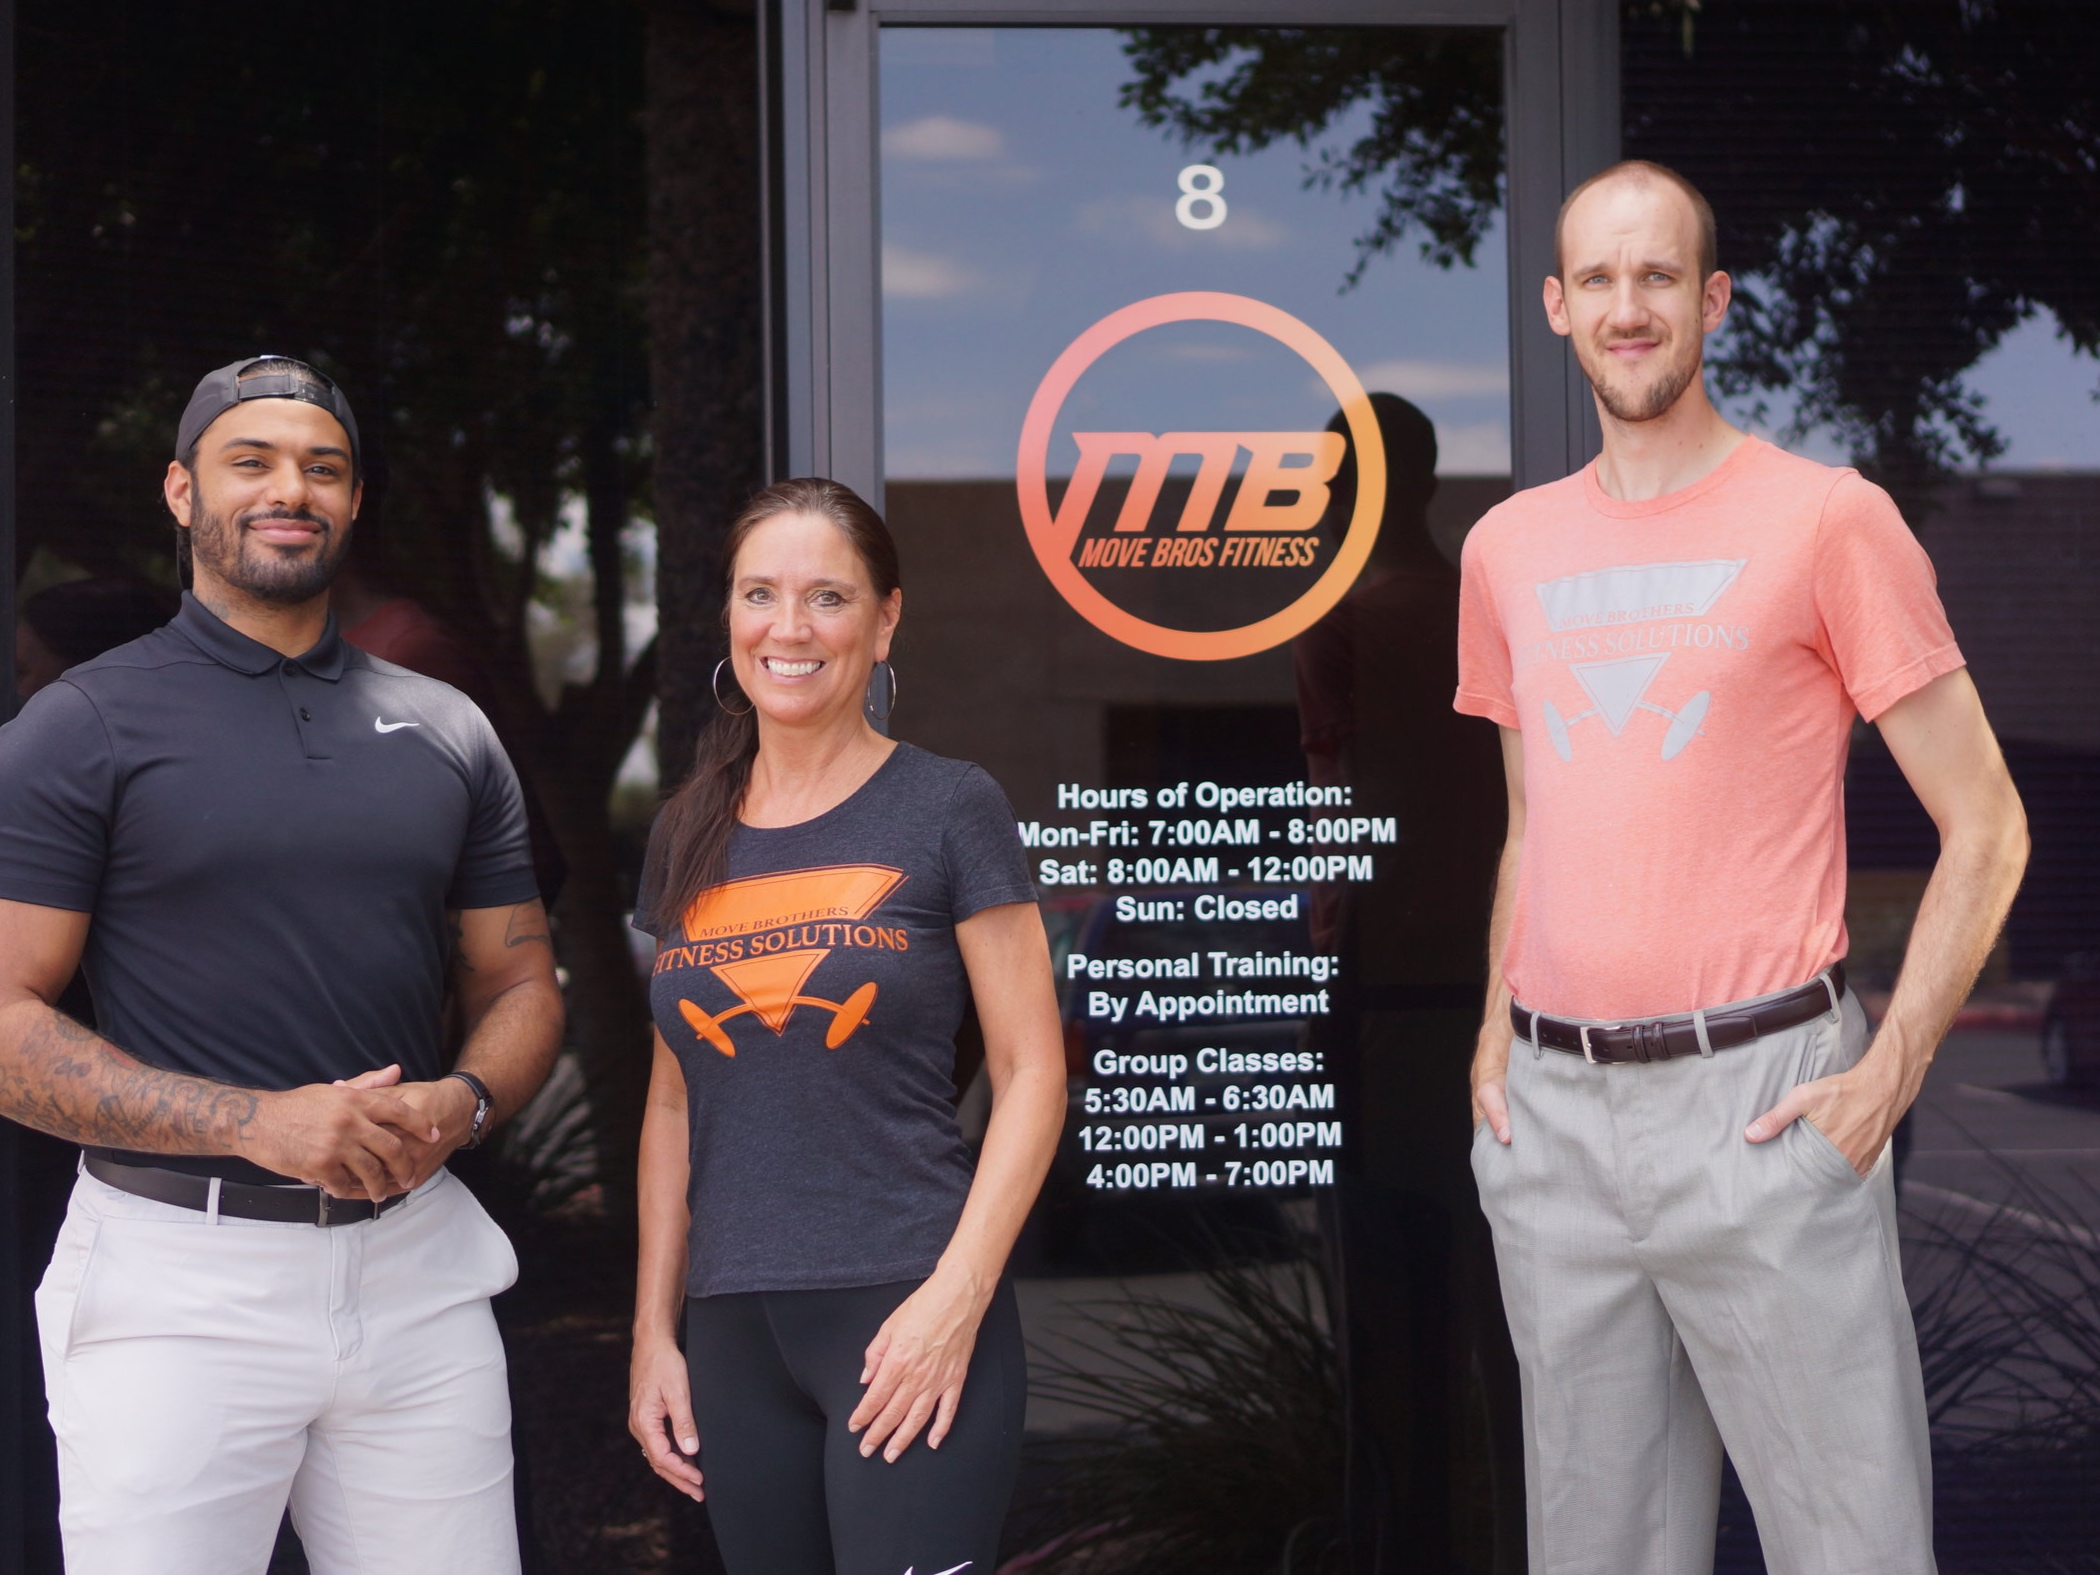 Eric, Ekklesia & Mara,    Move Bros Fitness Team